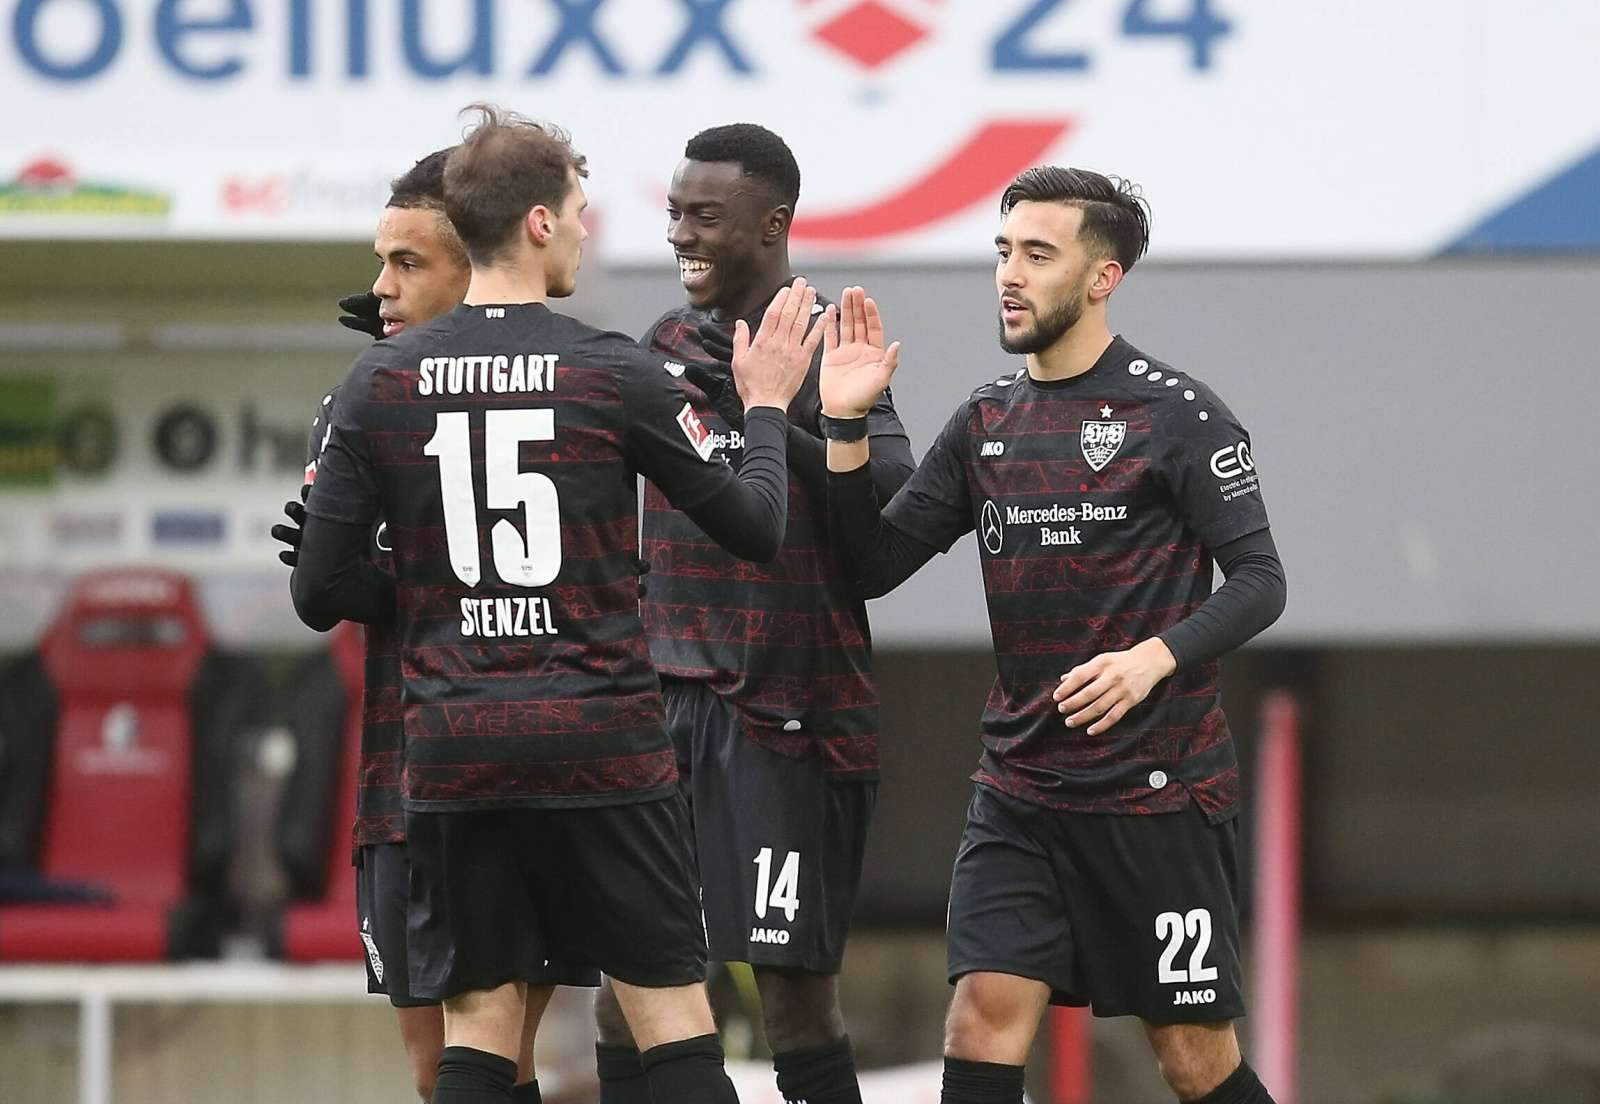 «Штуттгарт» - «Фрайбург»: прогноз и ставка на матч чемпионата Германии - 28 августа 2021